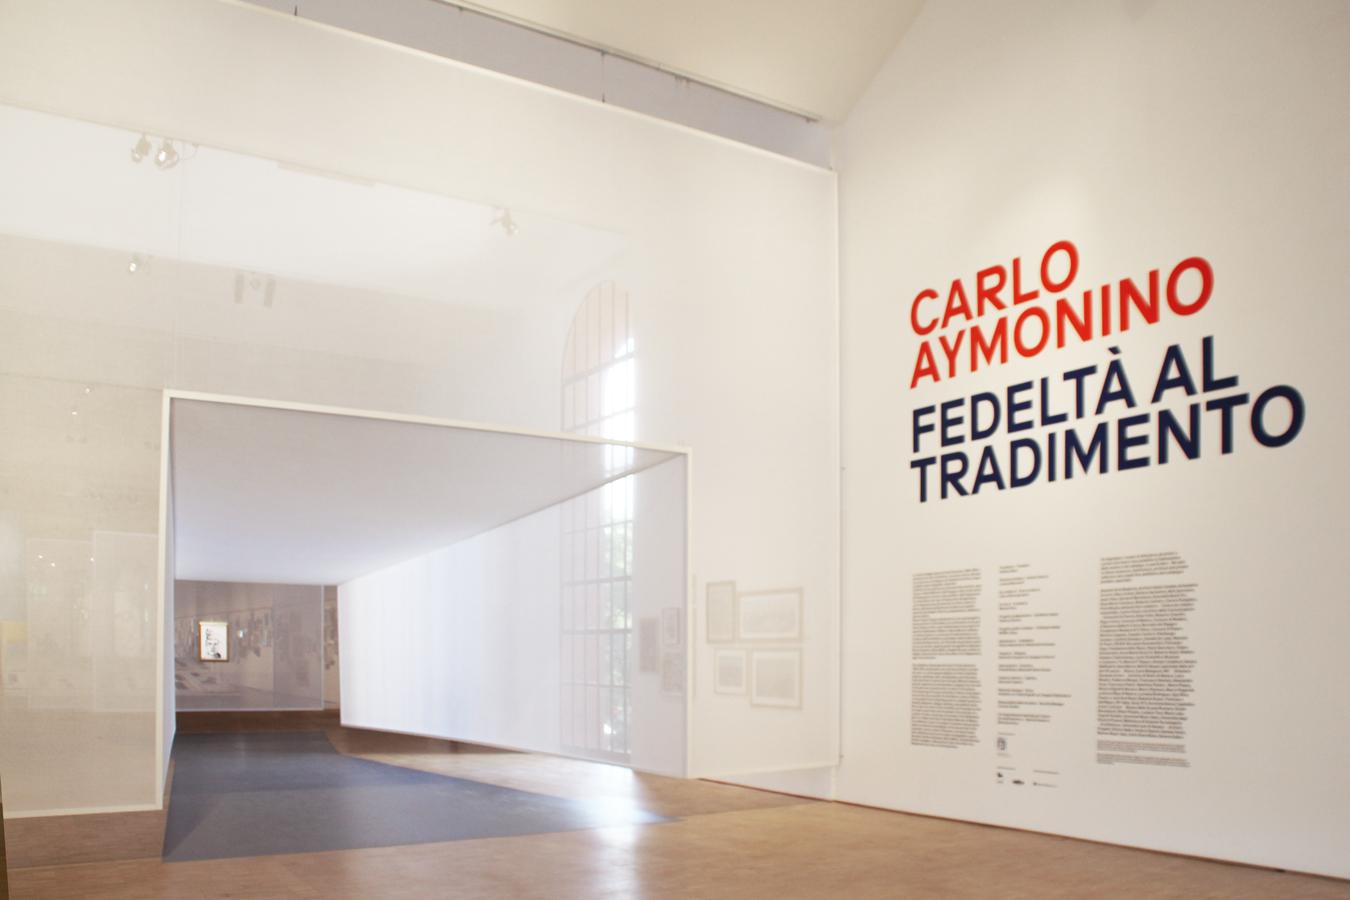 """Carlo Aymonino. Fedeltà al Tradimento"""